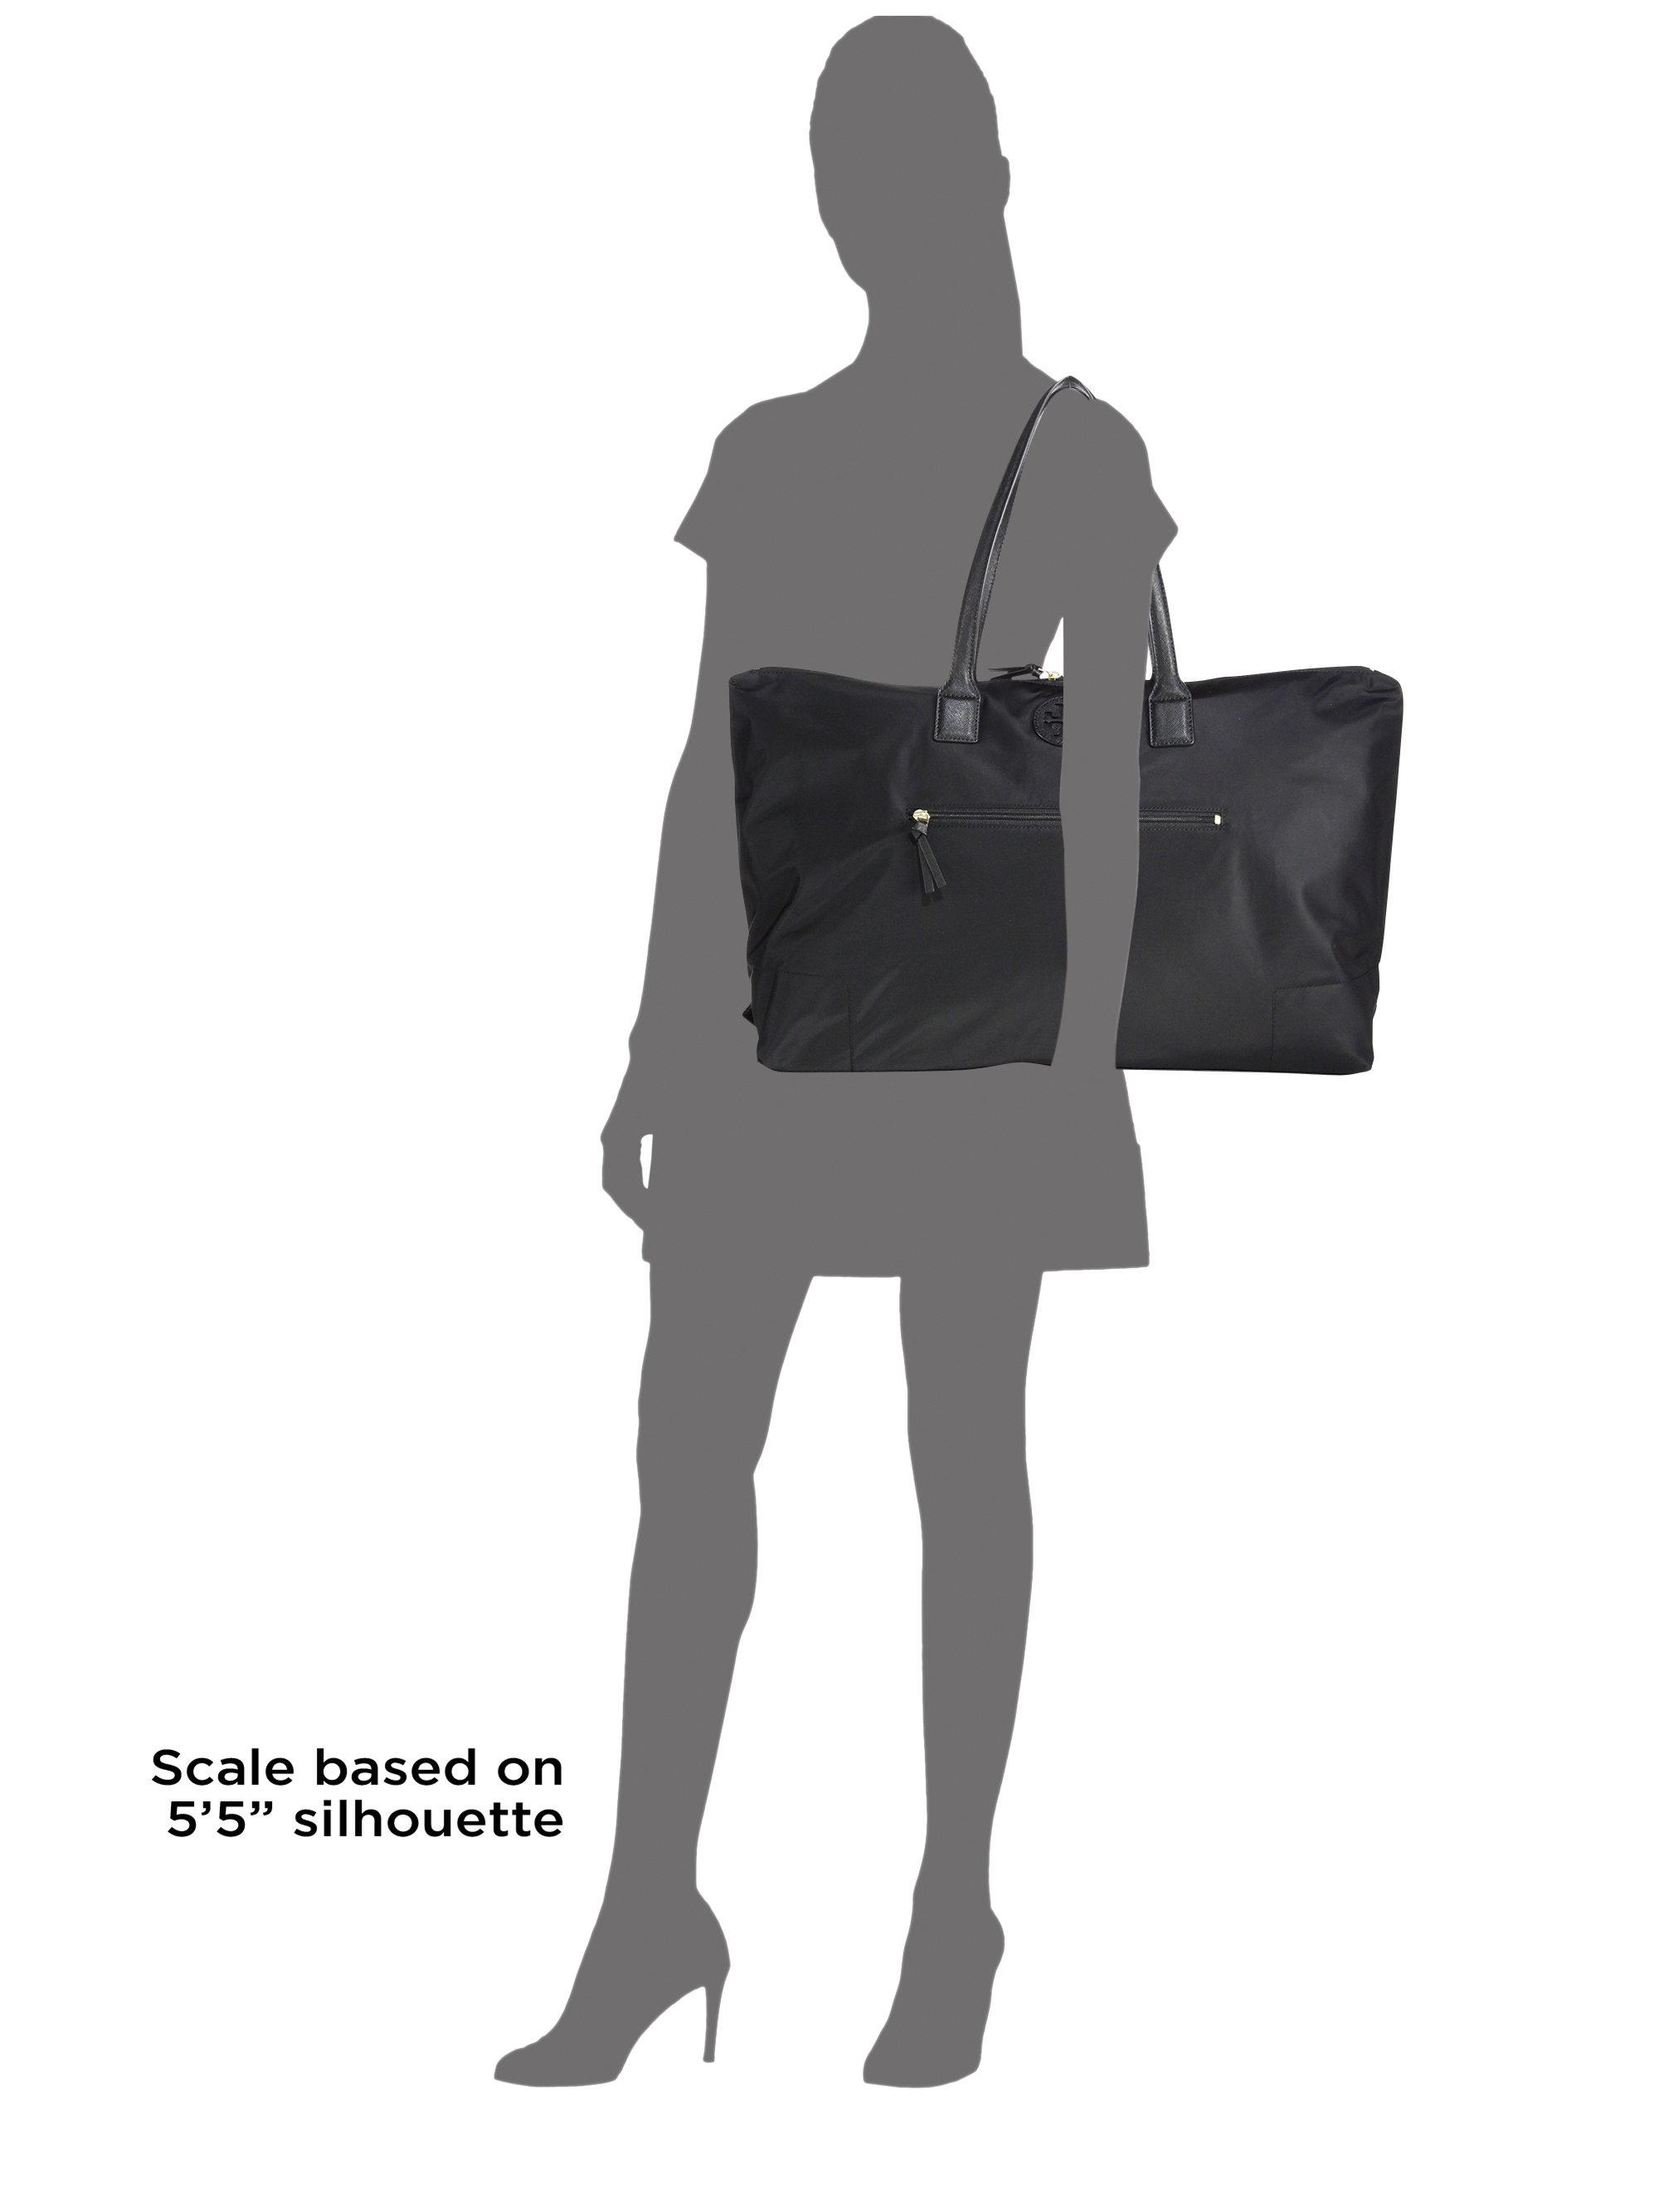 Lyst - Tory Burch Ella Packable Overnight Nylon Satchel in Black c6df834b57